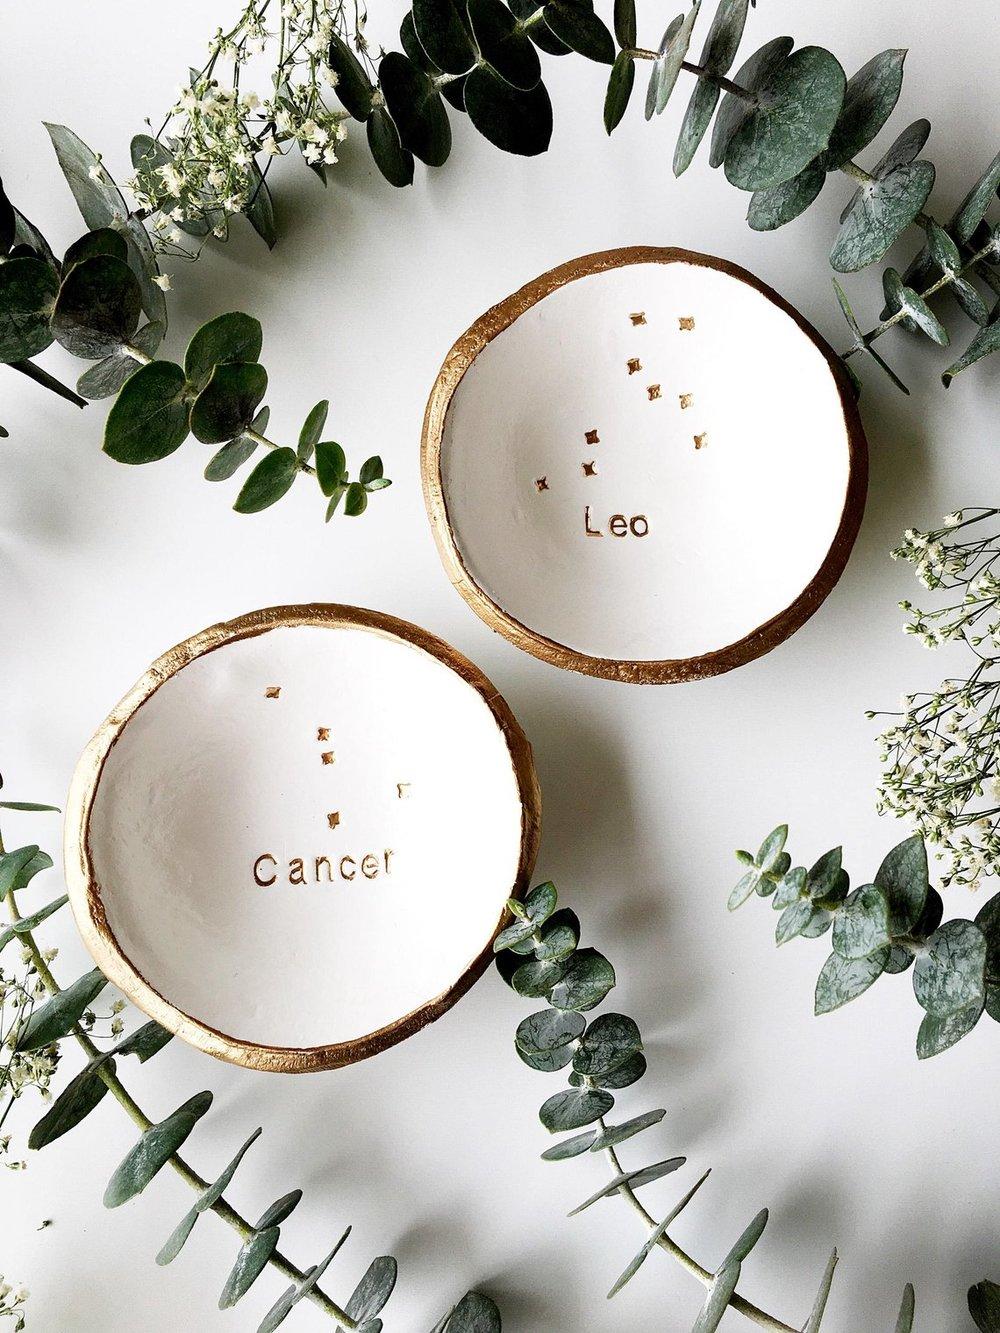 Zodiac Signs Personalized Jewelry Dish By ThePaintedPress